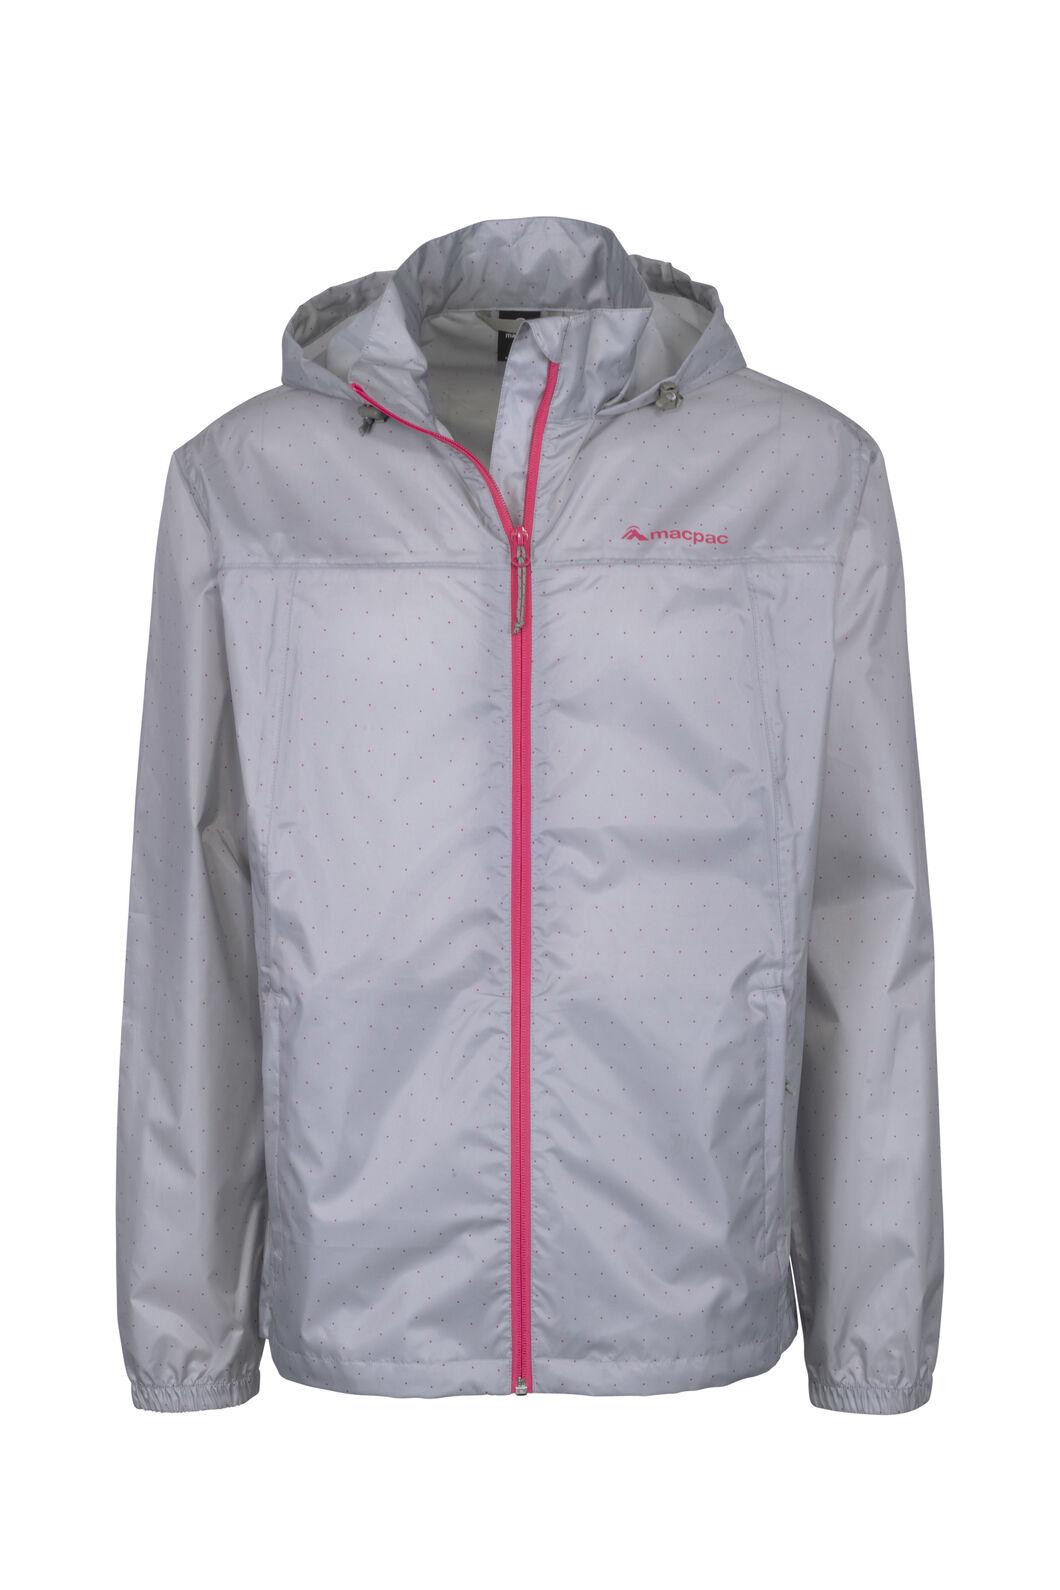 Macpac Pack-It-Jacket — Unisex, High Rise Polka Dot, hi-res